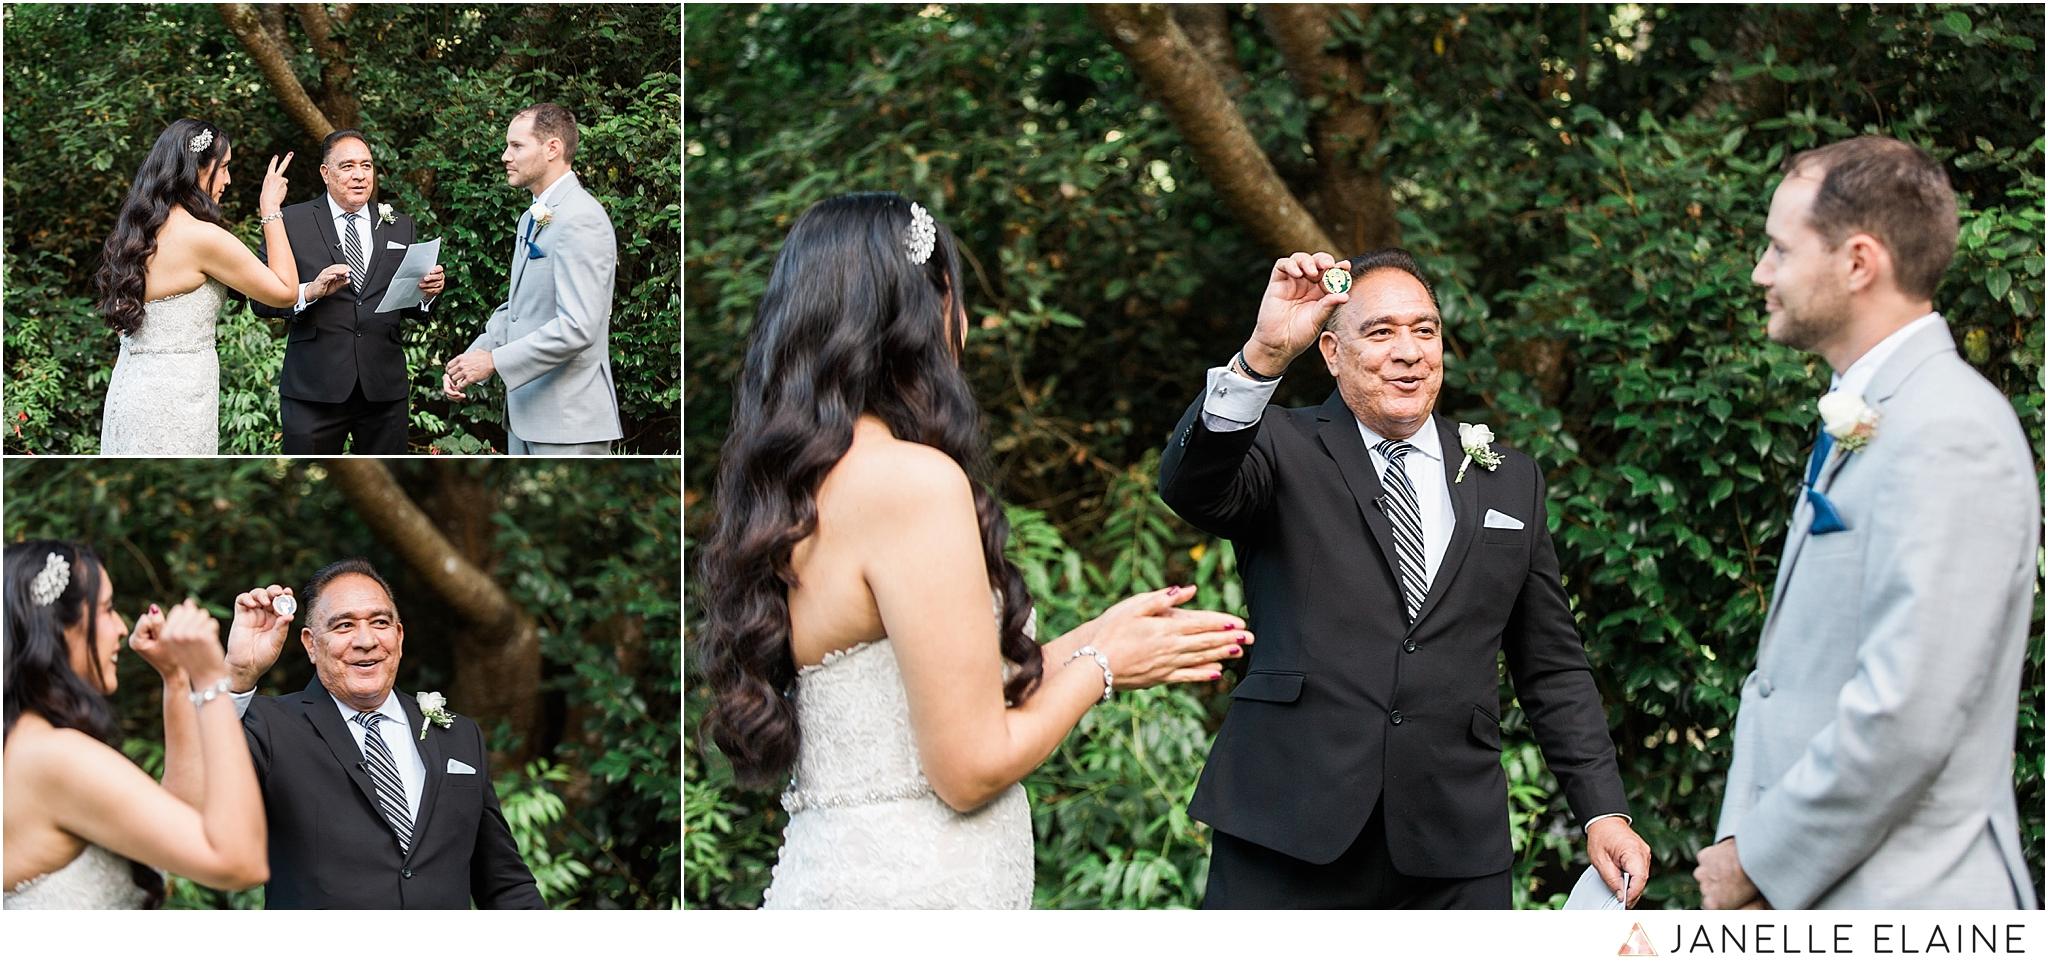 janelle elaine photography-professional wedding photographer-seattle-bellevue-robinswood house-155.jpg